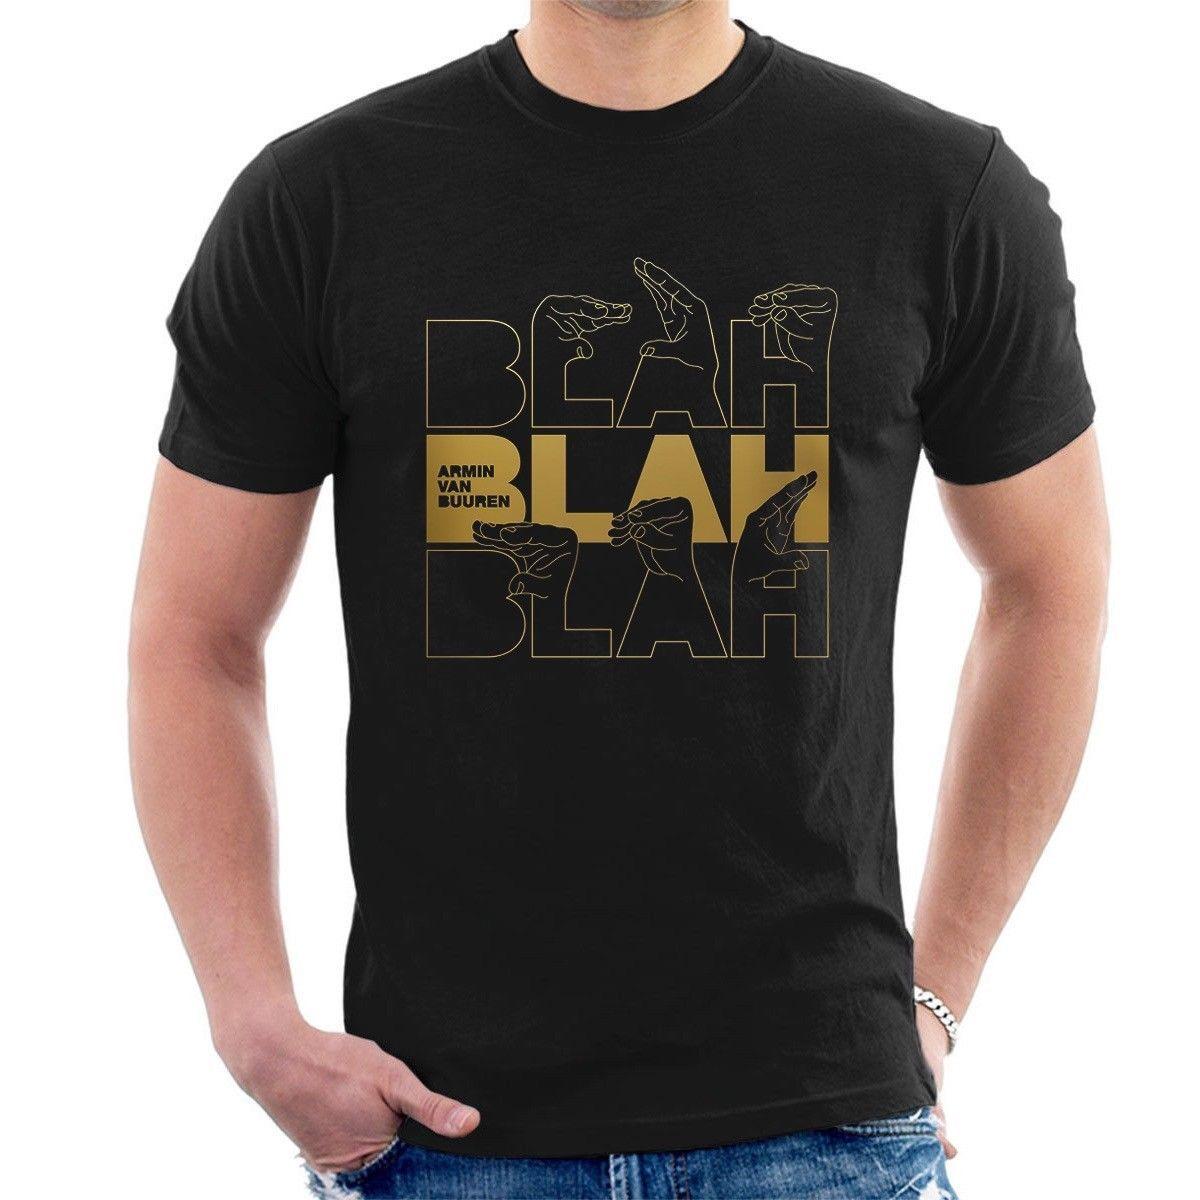 d5288d32f Compre ARMIN VAN BUUREN BLAH BLAH BLAH CAMISETA Trance Music Fans B33 Tops  Al Por Mayor Tee Personalizada Environmental 2018 Hot Tees A  11.01 Del ...